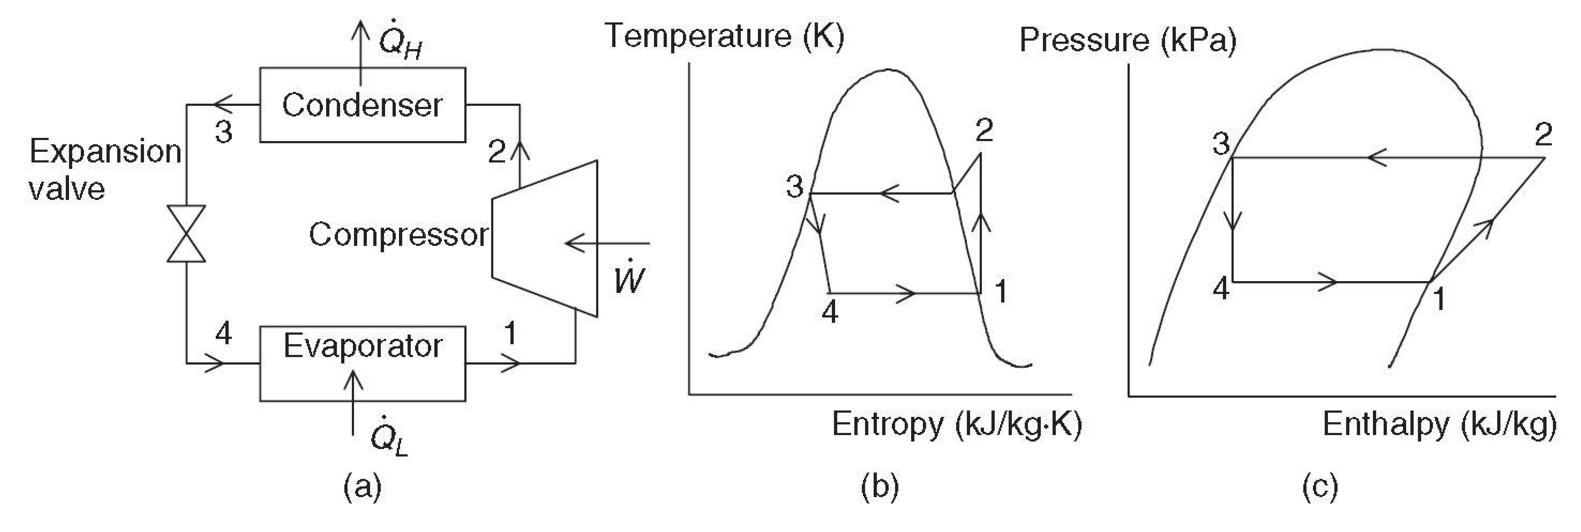 small resolution of evaporator hvac diagram wiring diagrams schematics condenser coil drawing condenser coil diagram